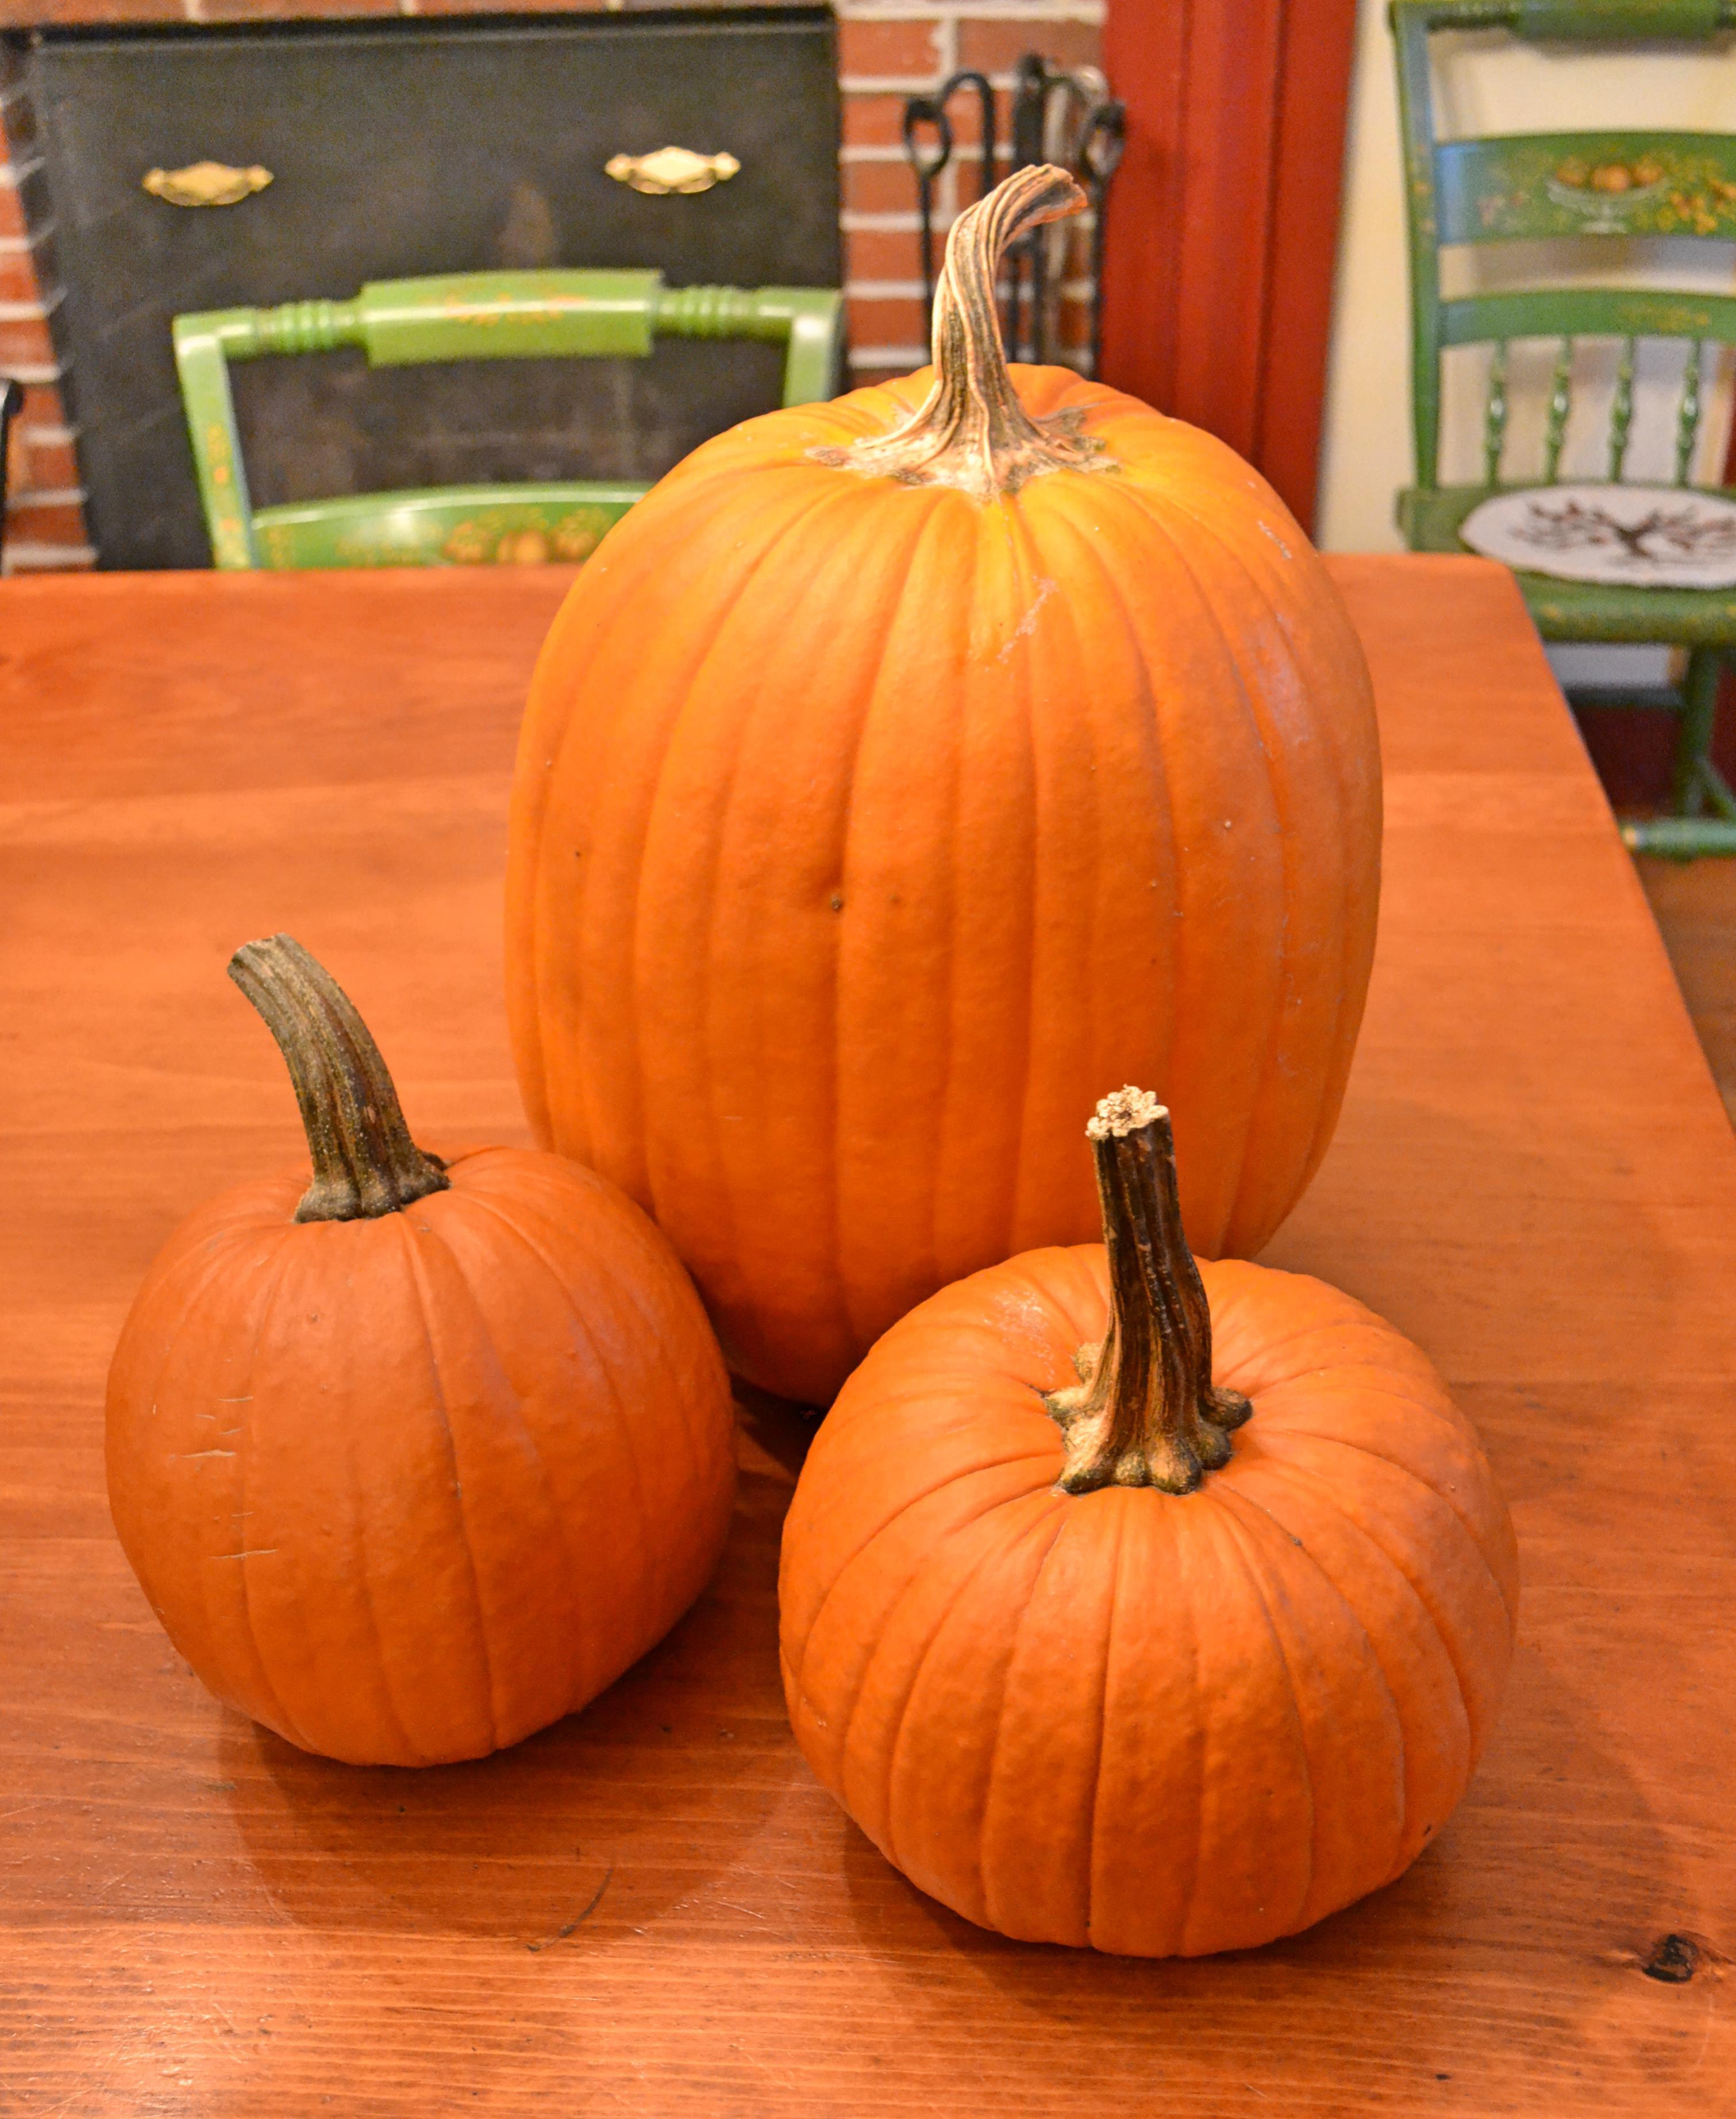 It S Pie Season Prepare Your Pumpkins A Guide To